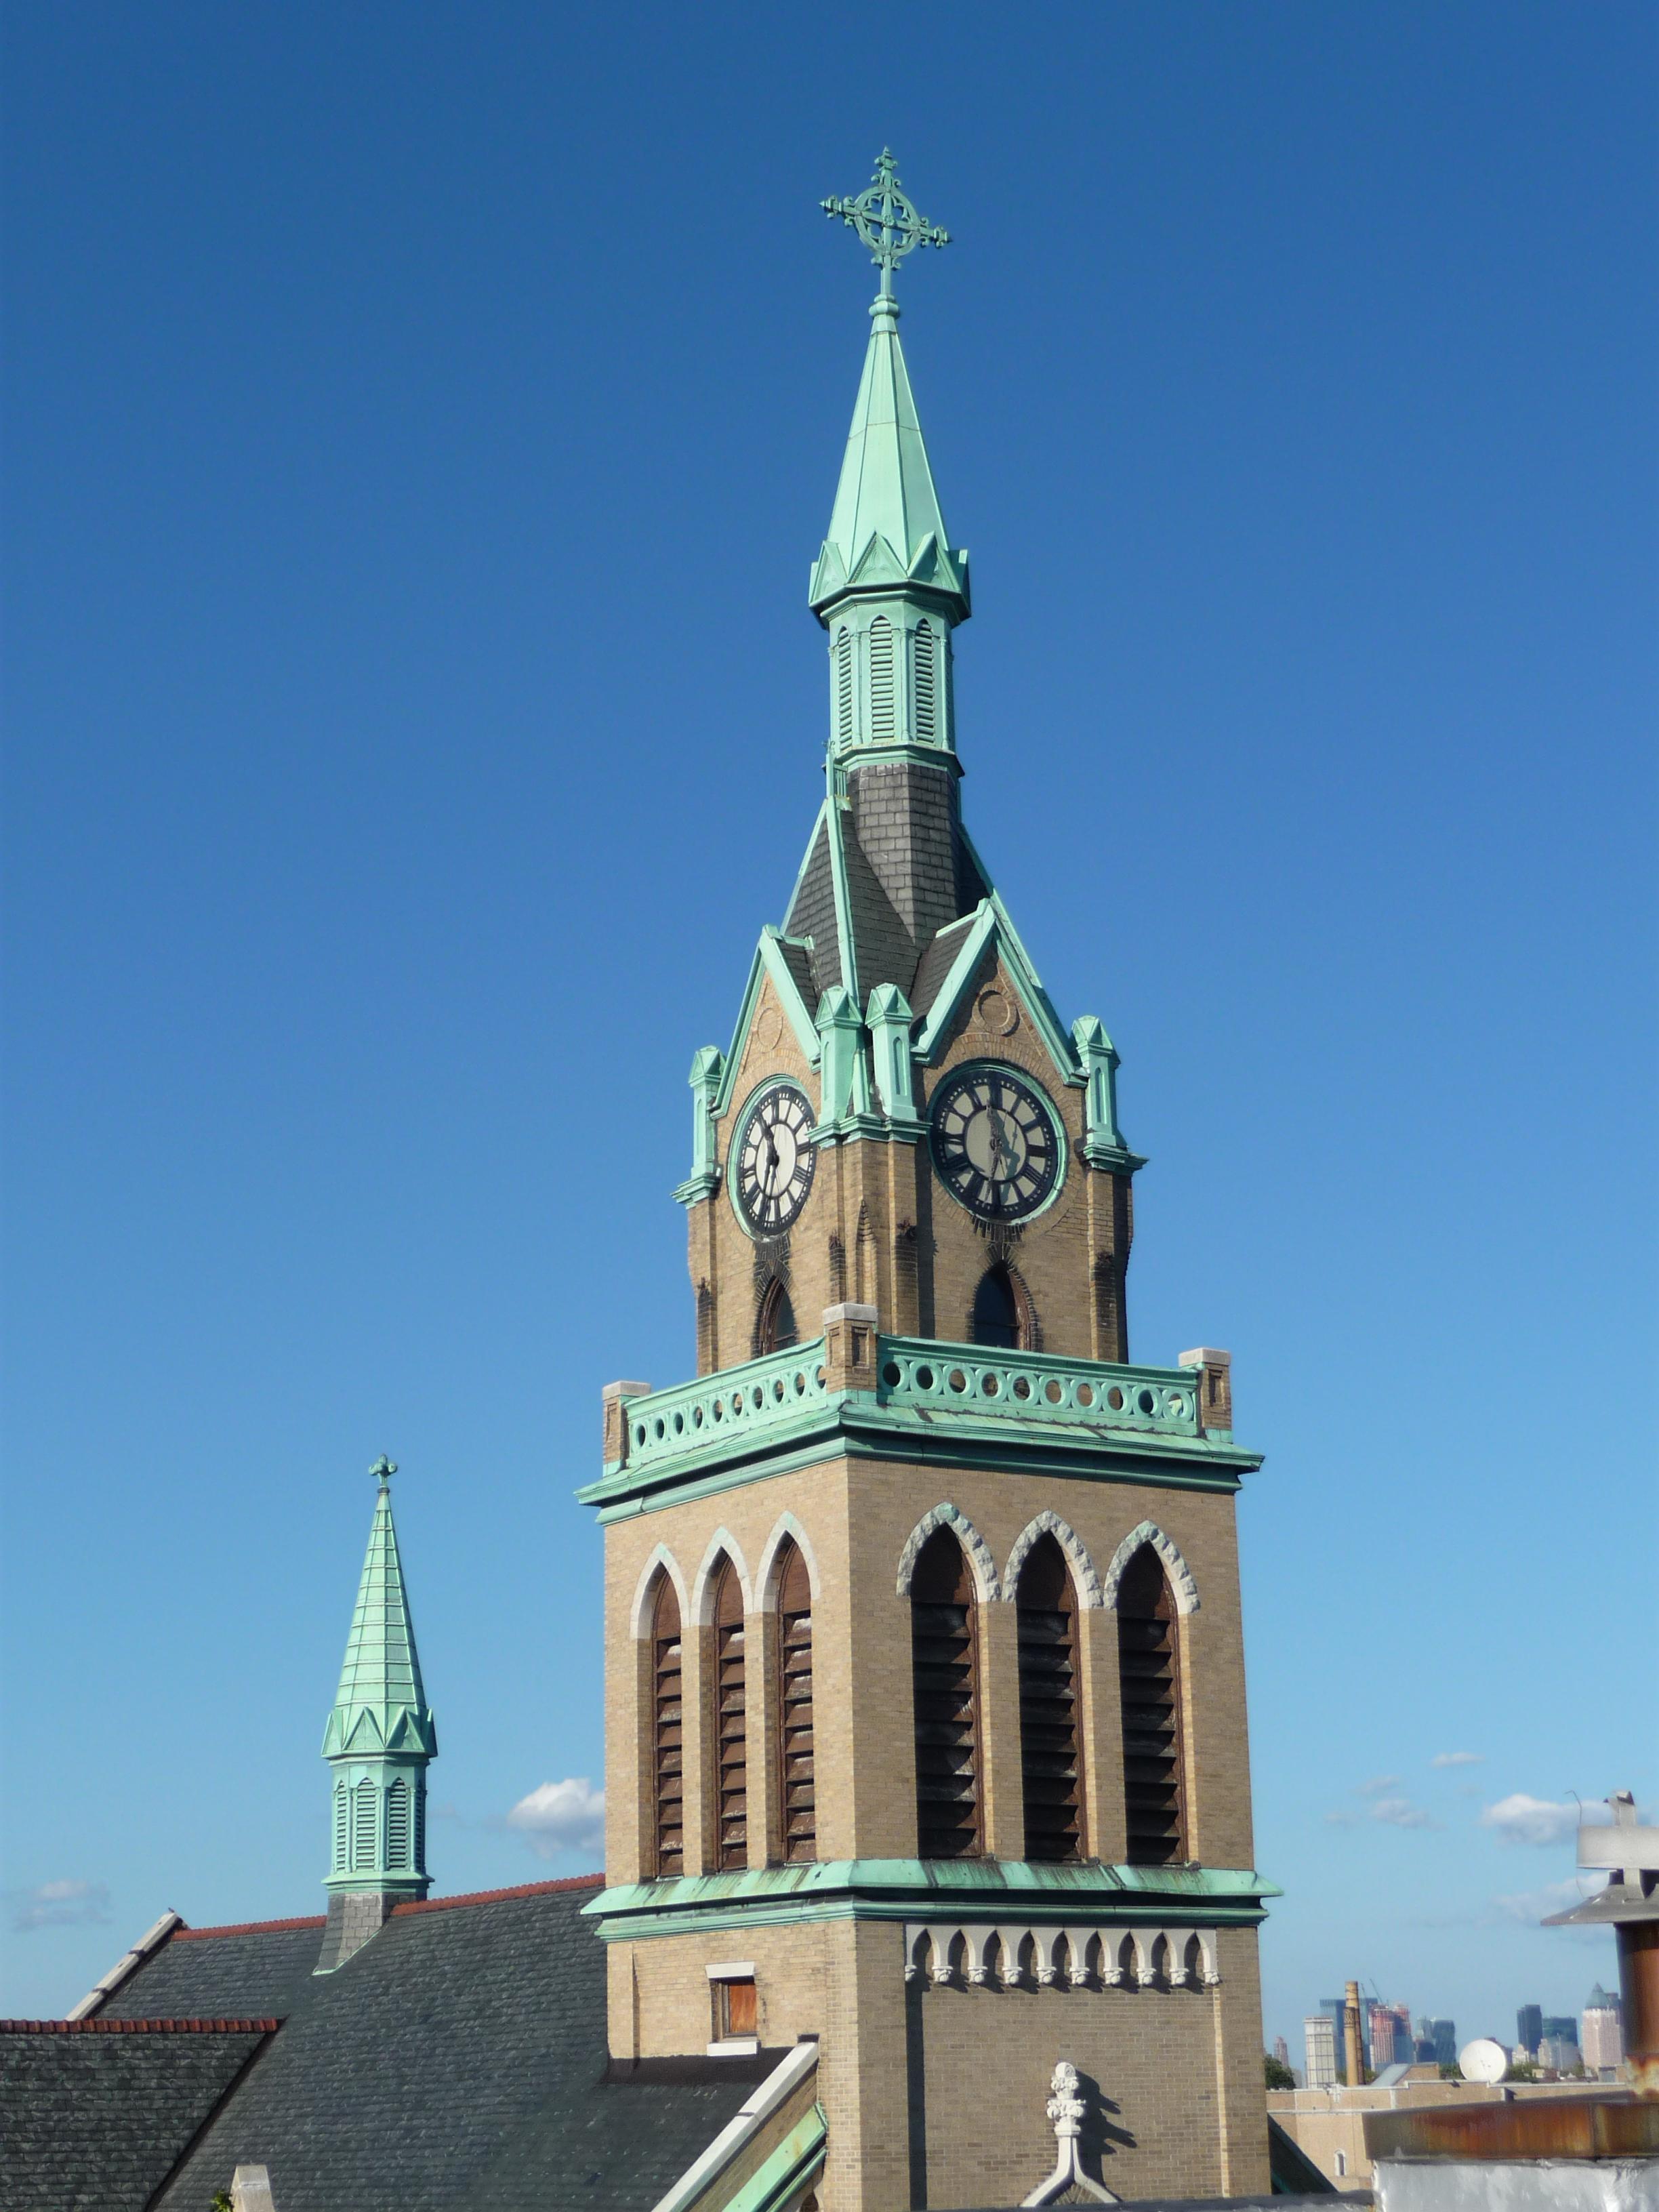 Filestjohnschurchsteepleg wikimedia commons filestjohnschurchsteepleg altavistaventures Images